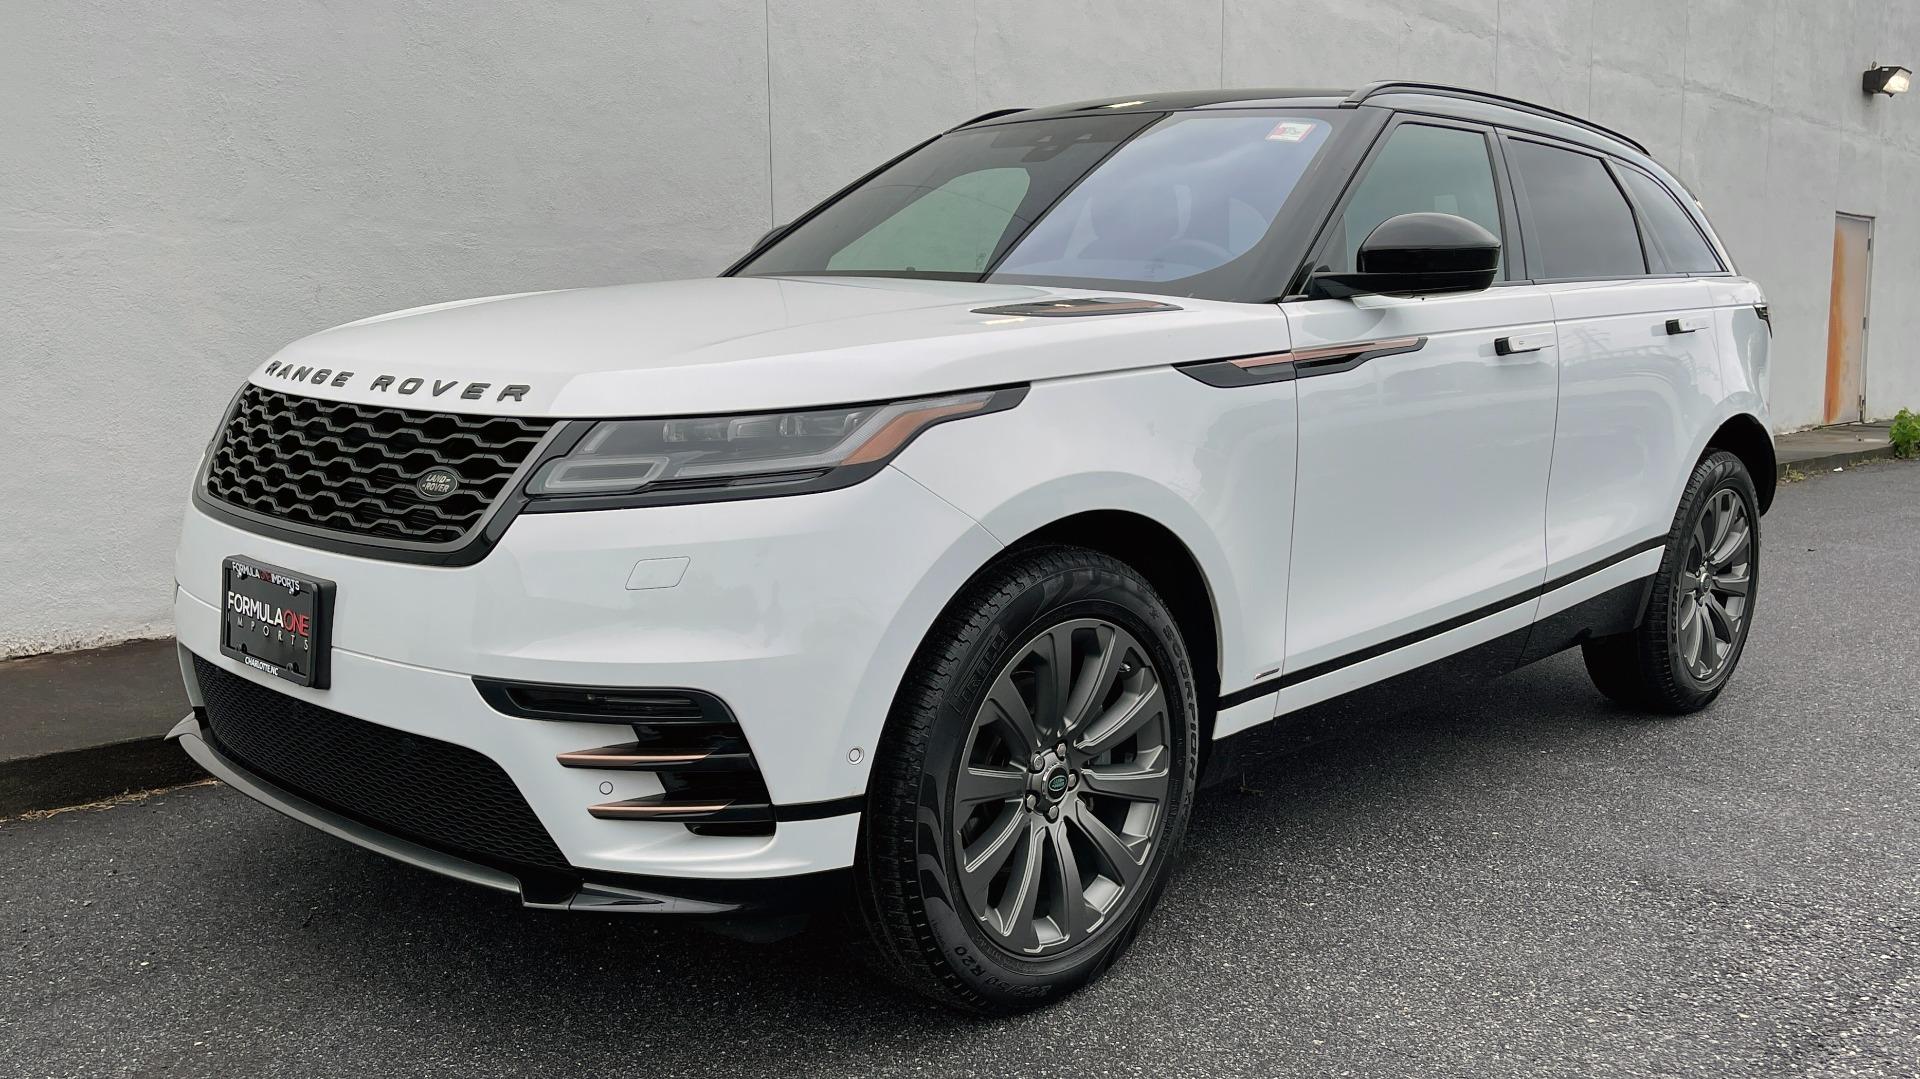 Used 2018 Land Rover RANGE ROVER VELAR R-DYNAMIC SE / NAV / PREM / MERIDIAN / SUNROOF / REARVIEW for sale $54,995 at Formula Imports in Charlotte NC 28227 1